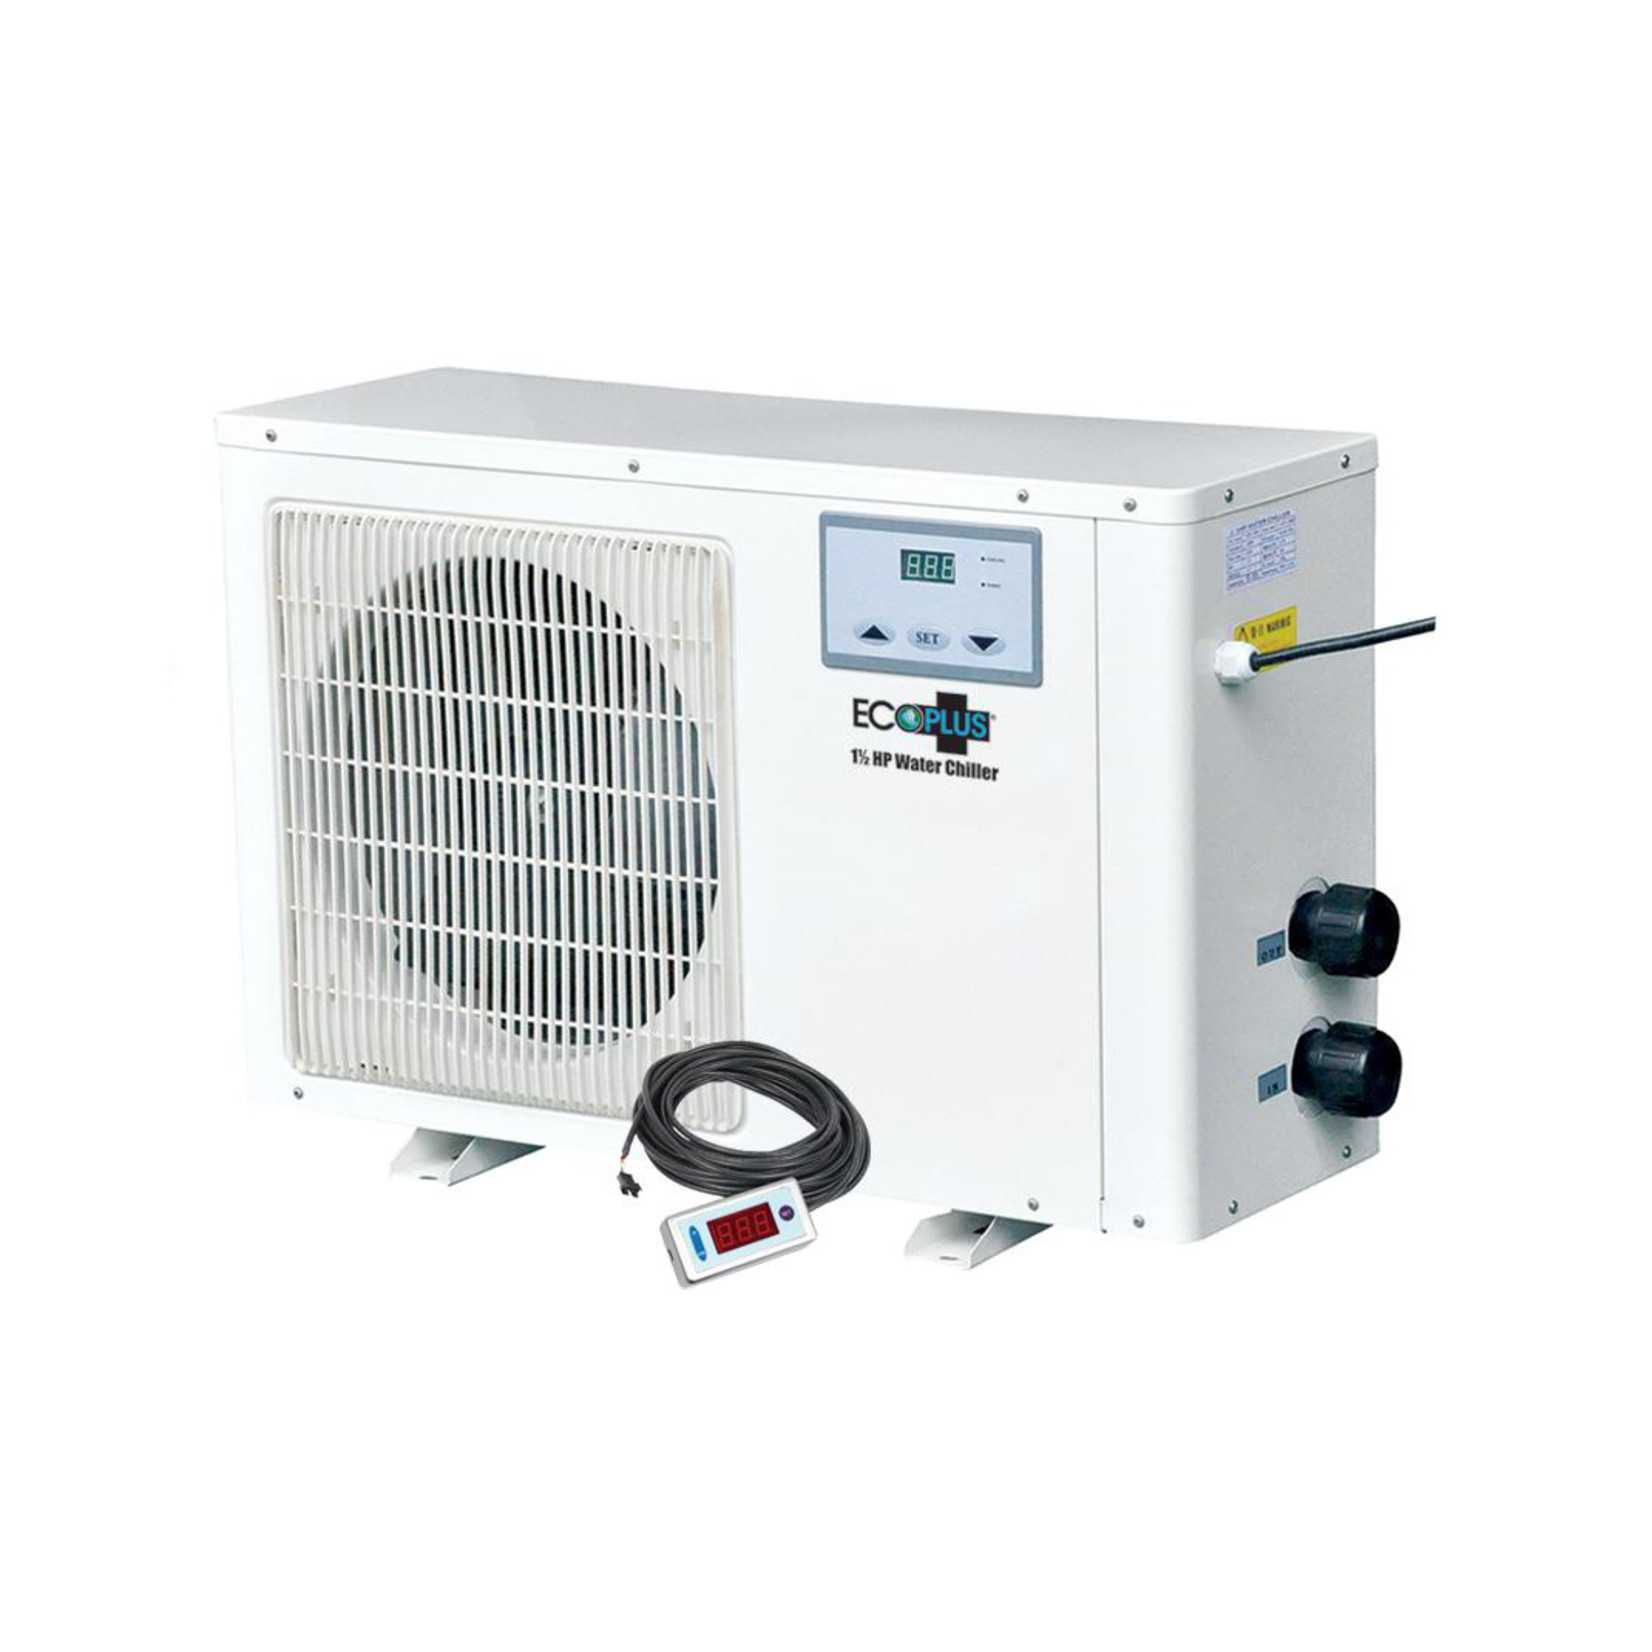 Ecoplus EcoPlus Commercial Grade Water Chiller 1 HP